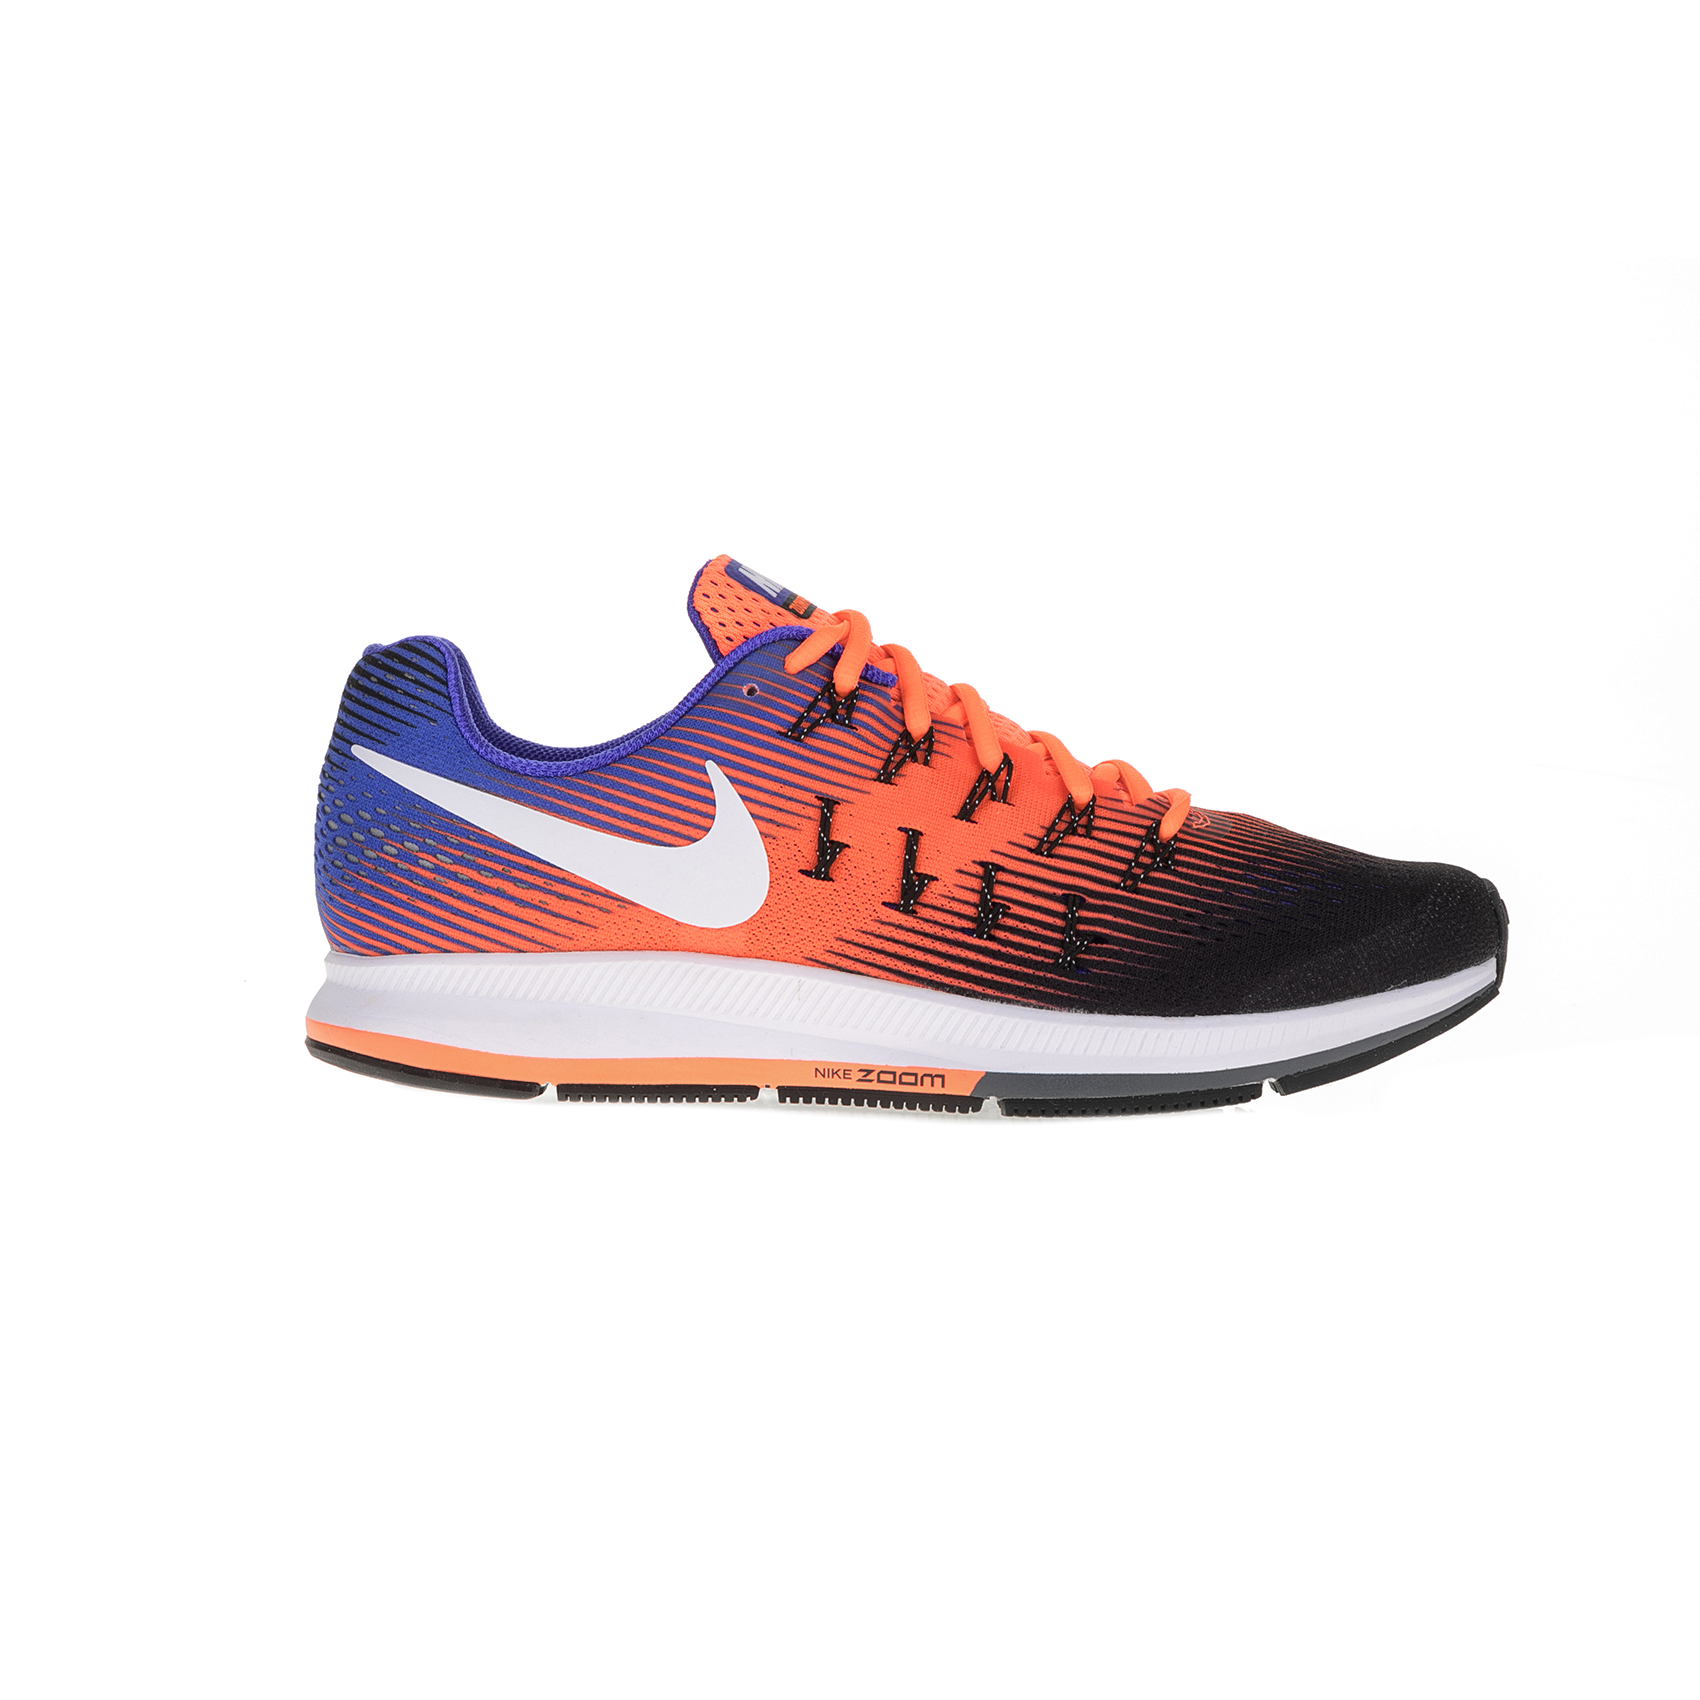 NIKE – Ανδρικά αθλητικά παπούτσια Nike AIR ZOOM PEGASUS 33 μπλε-πορτοκαλί-μαύρα